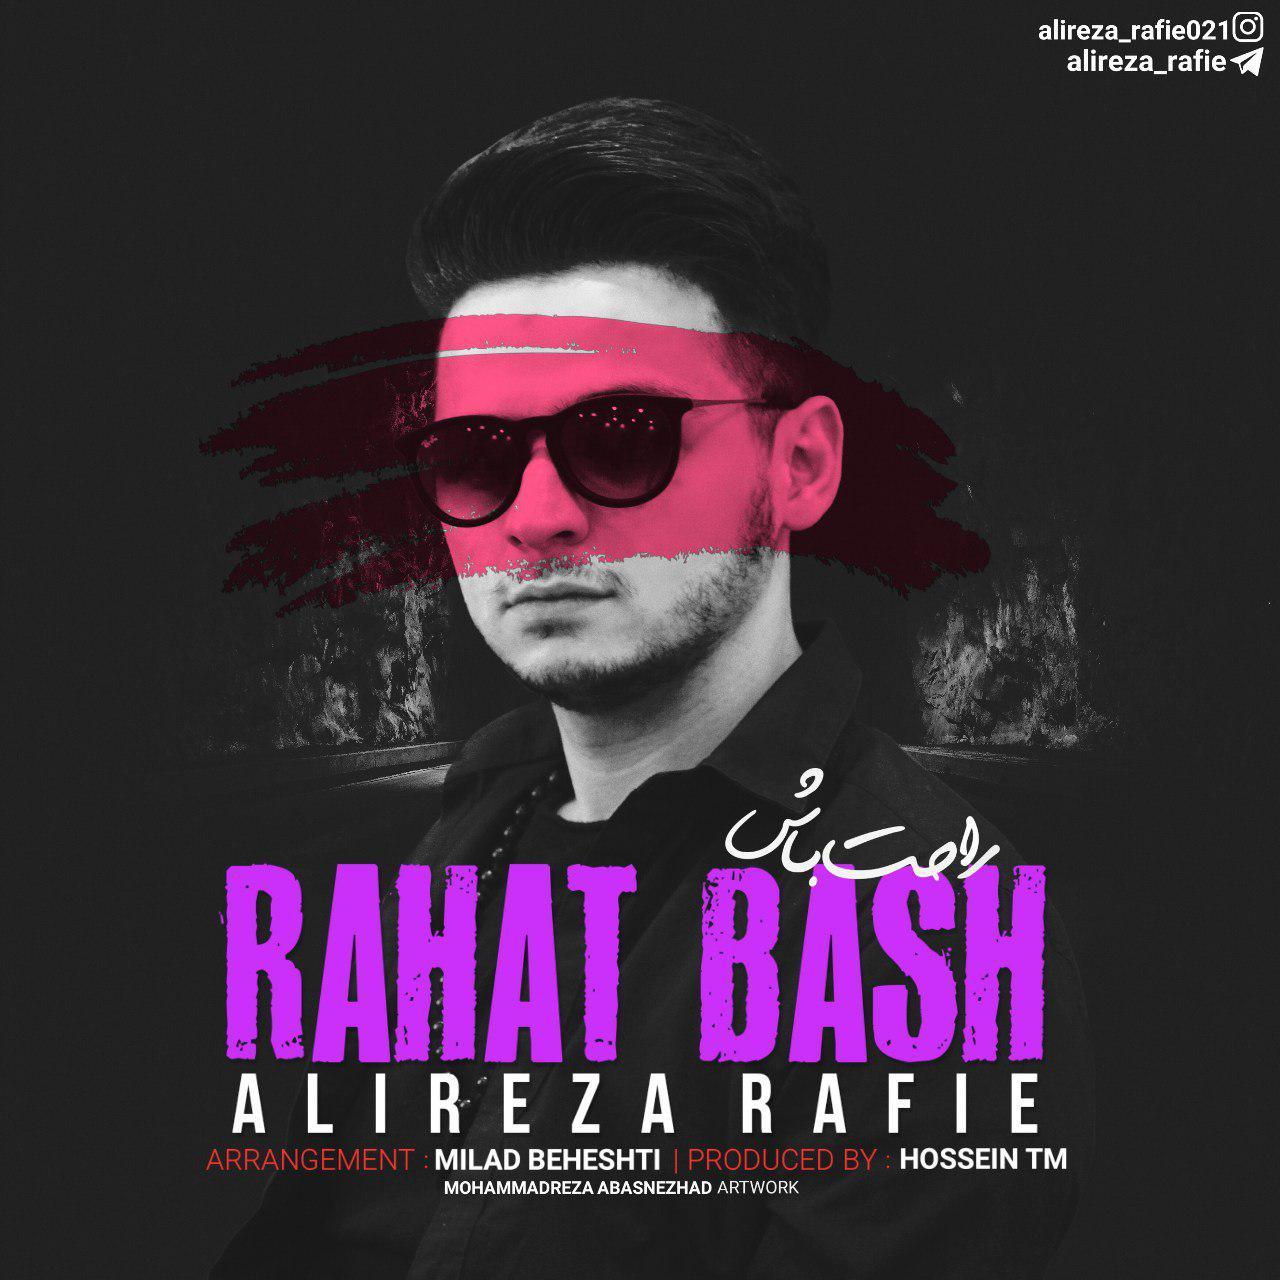 Alireza Rafie – Rahat Bash